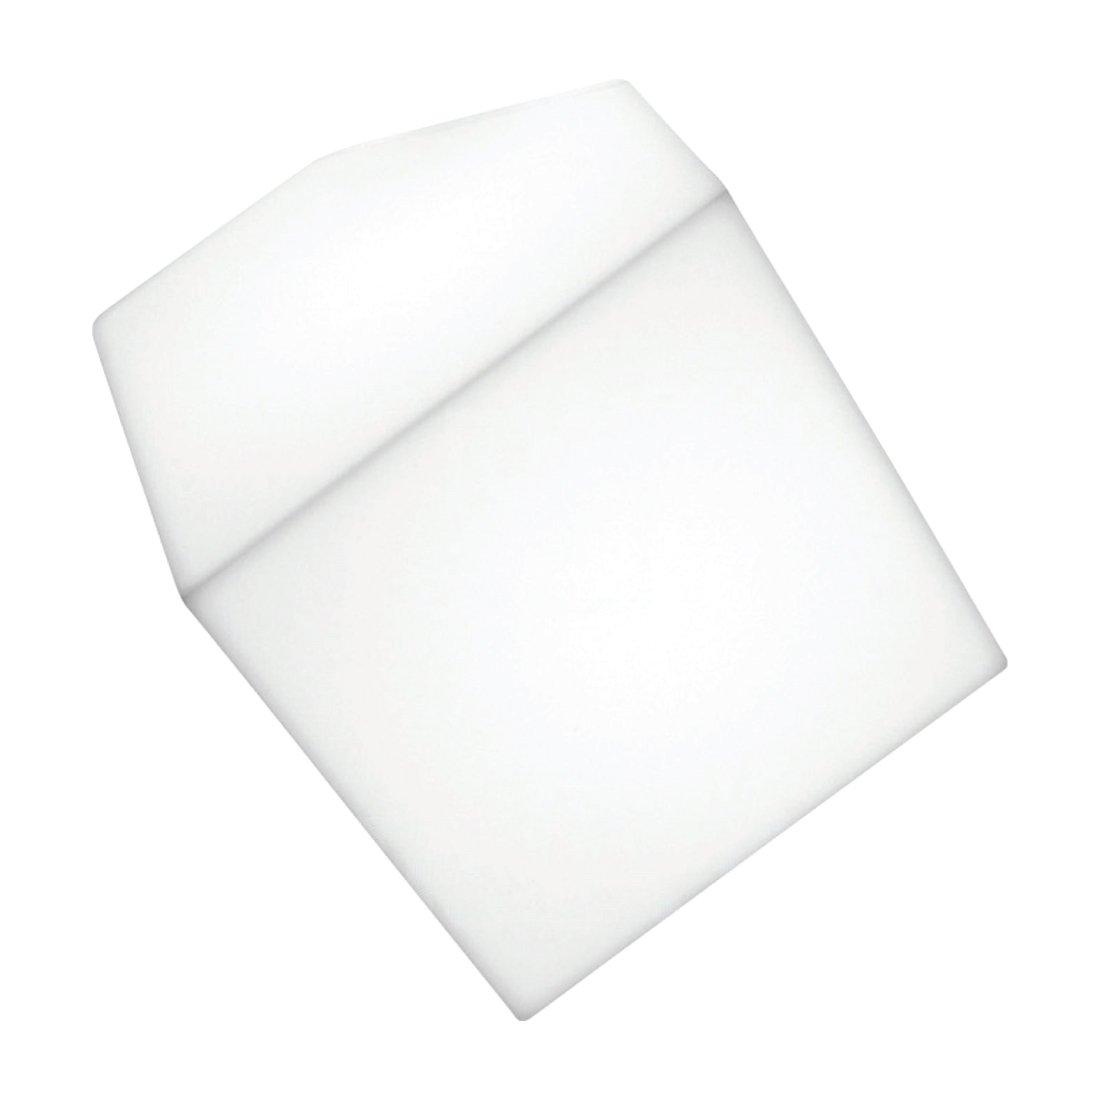 Edge 30 Wand- en Plafondlamp - Artemide